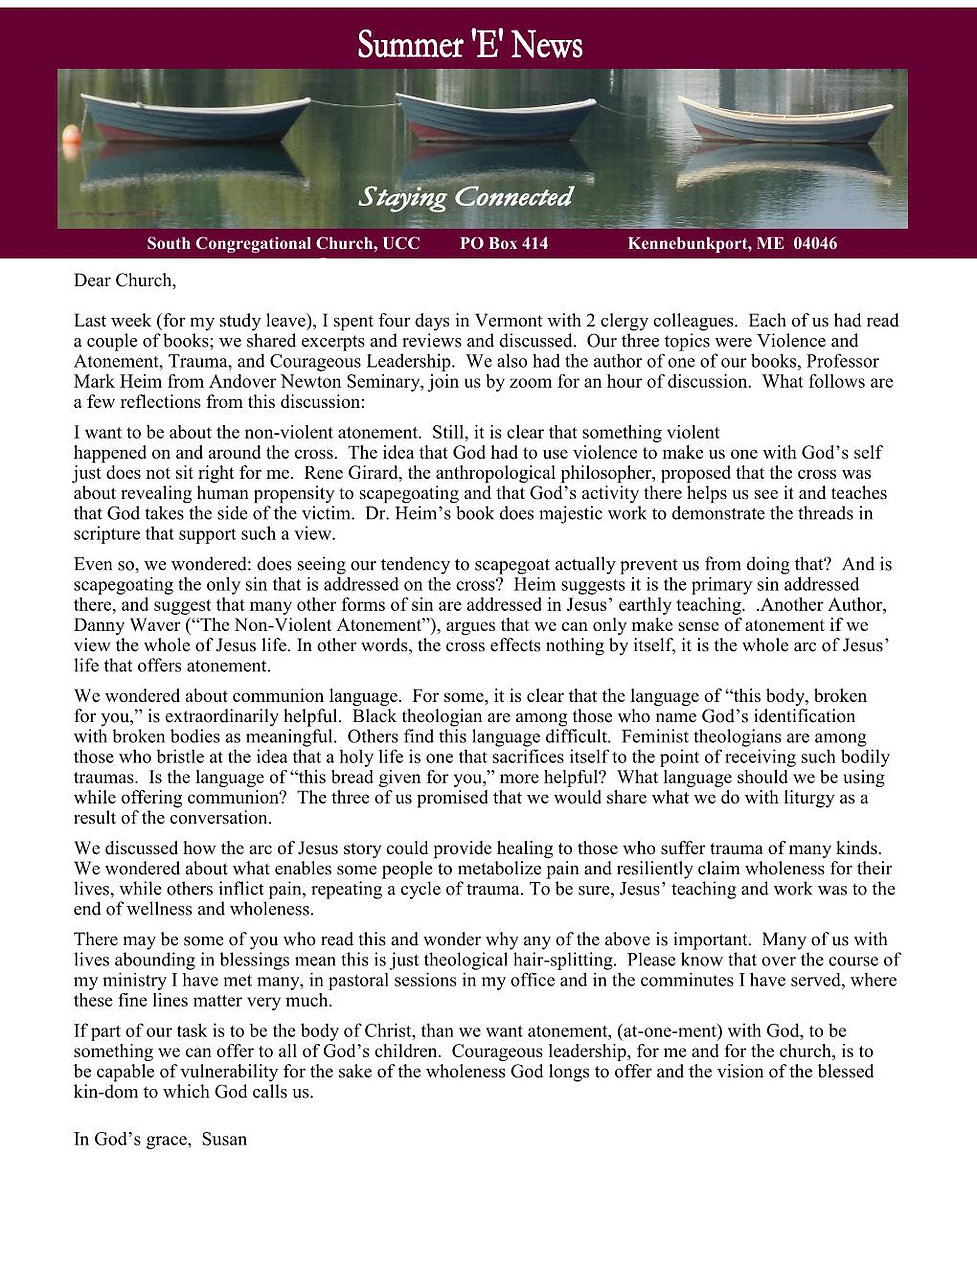 summer e-news Page 001.jpg